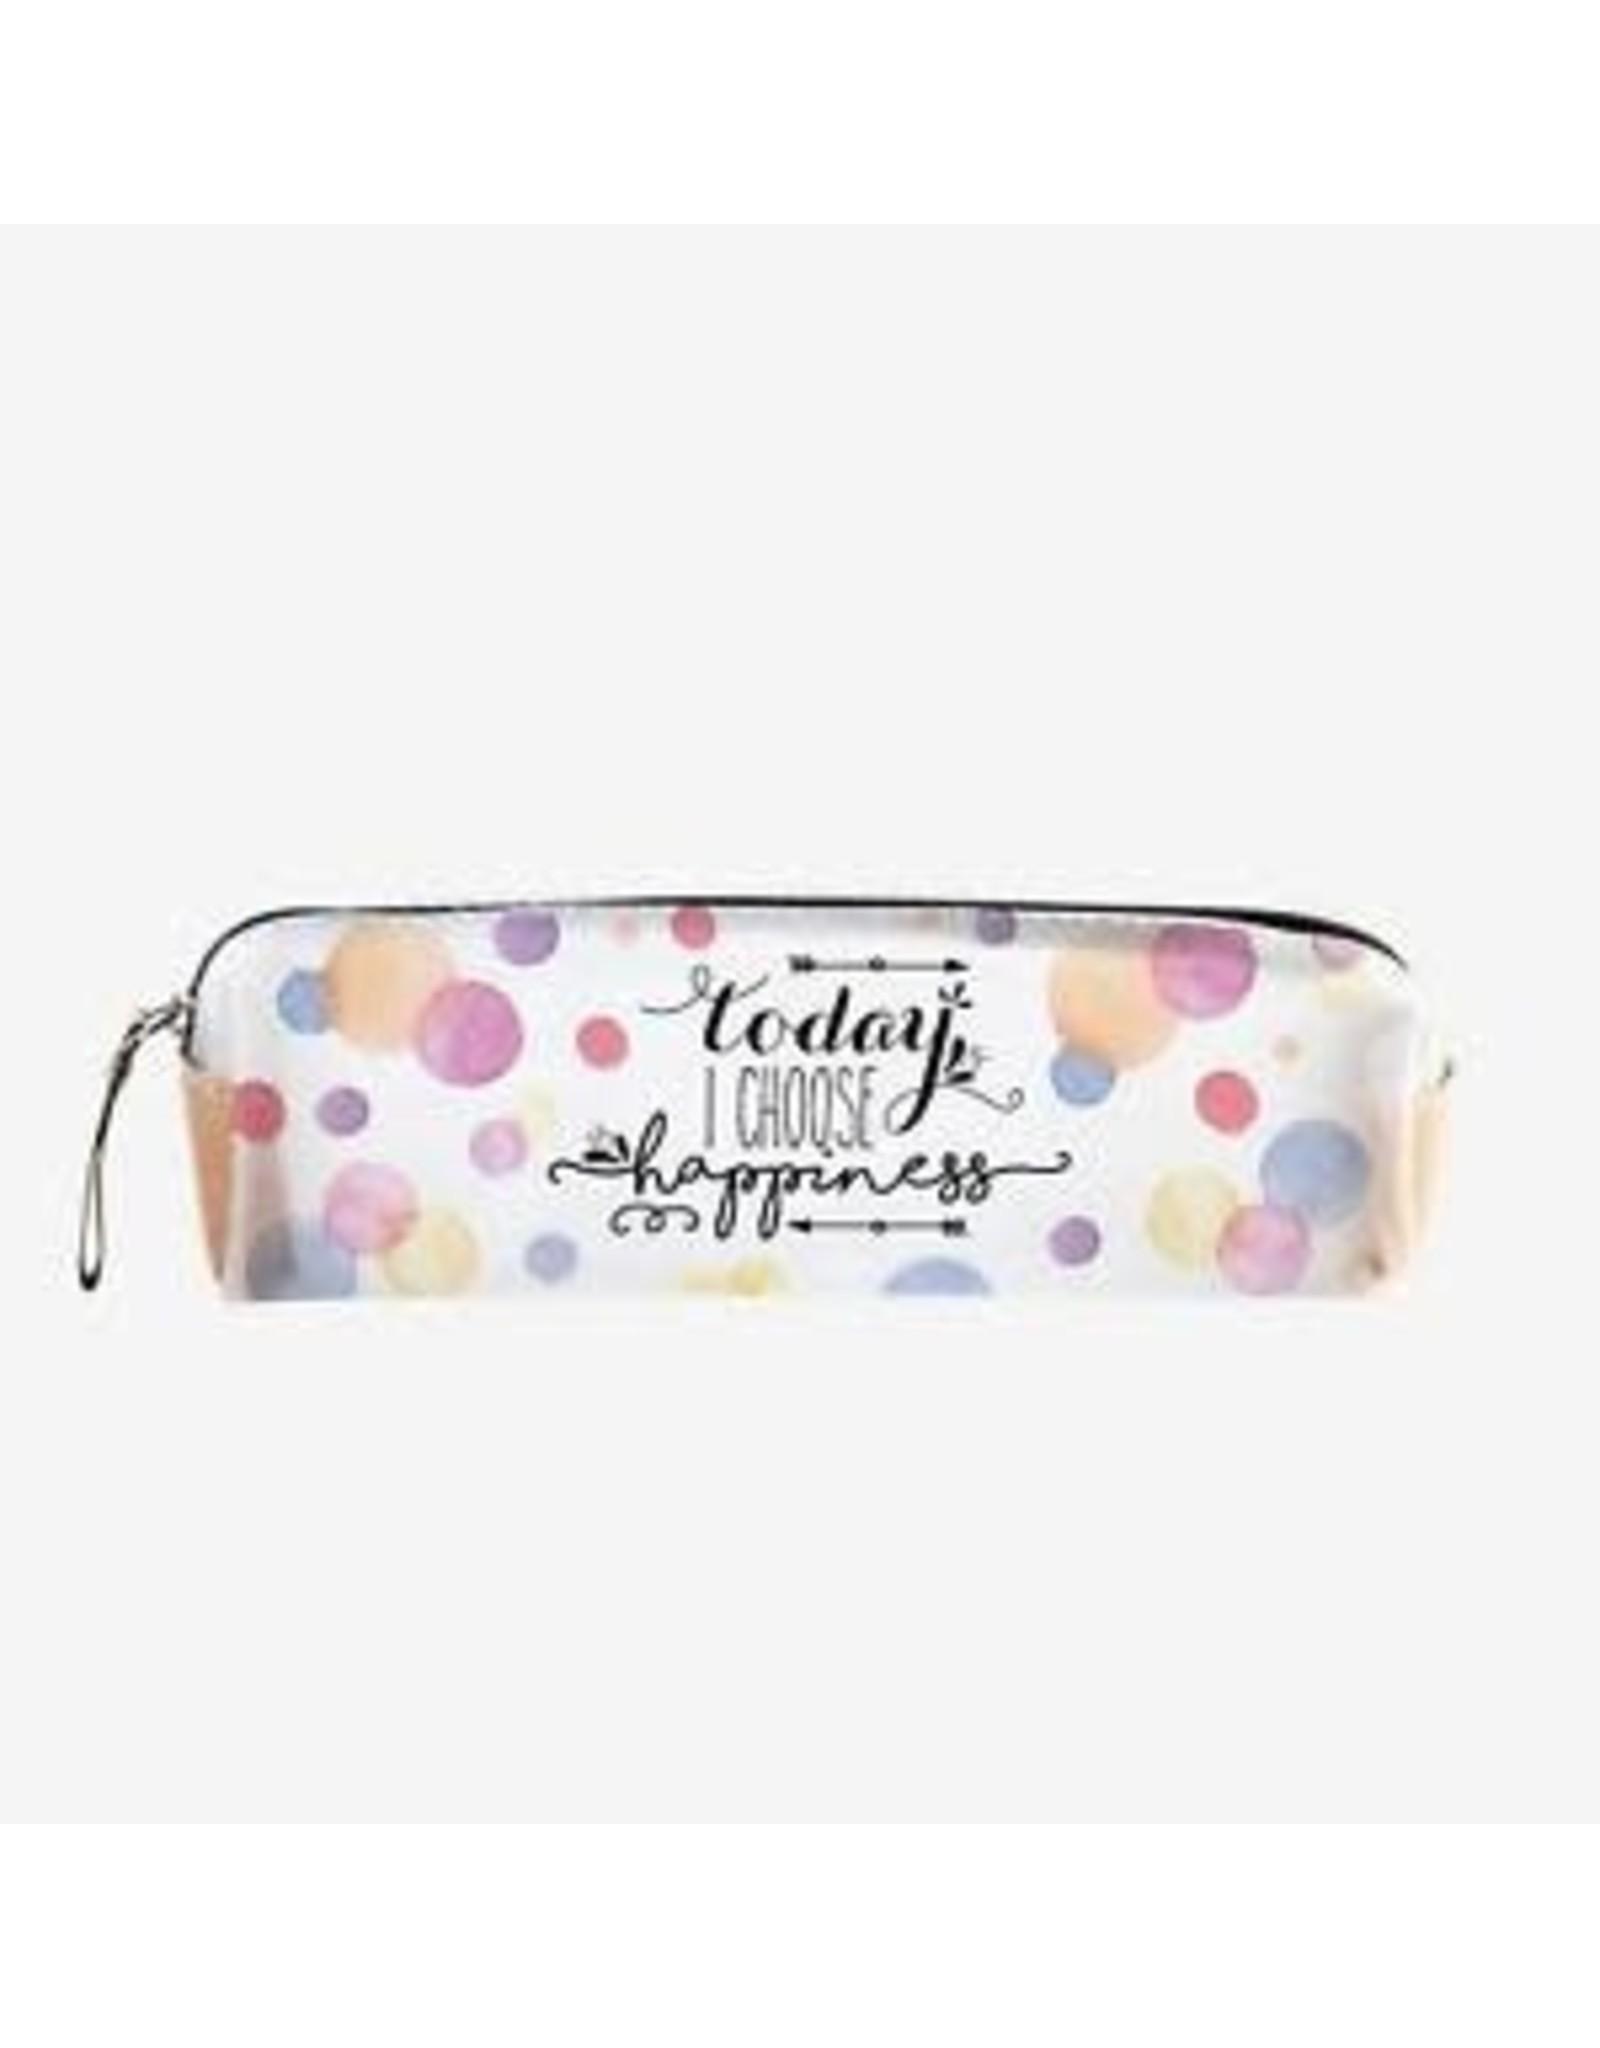 Legami pencil case - choose happiness